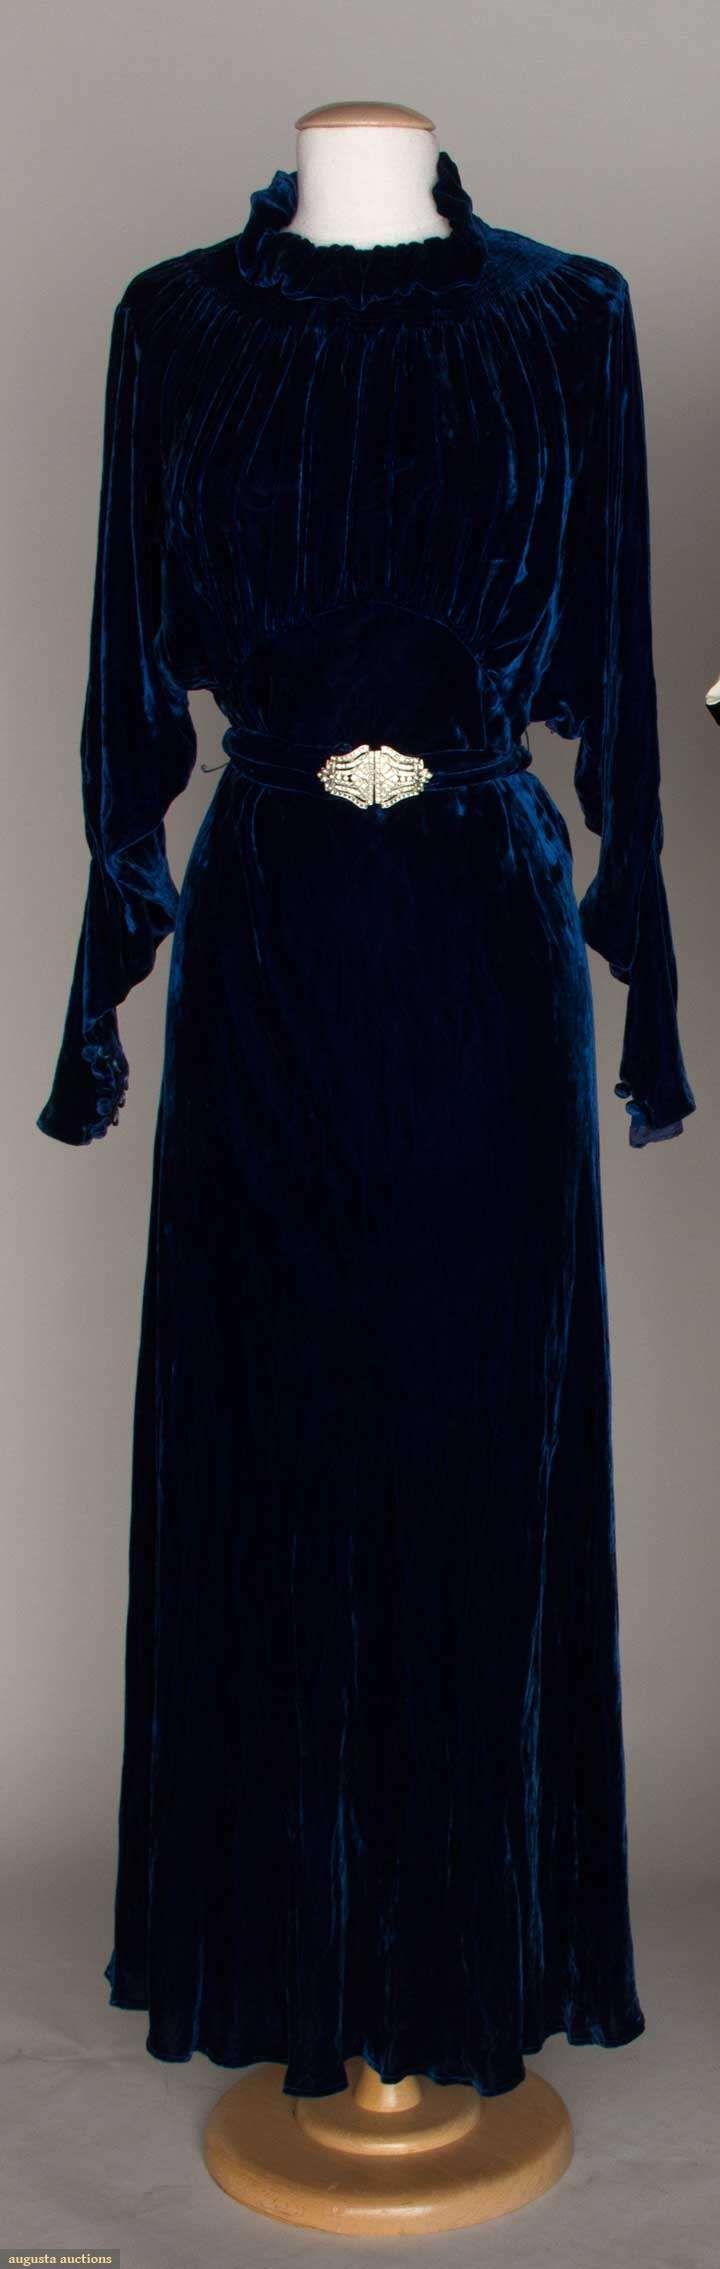 1 navy blue, high ruffled collar, long sleeves & rhinestone belt buckle  ca 1920-1949